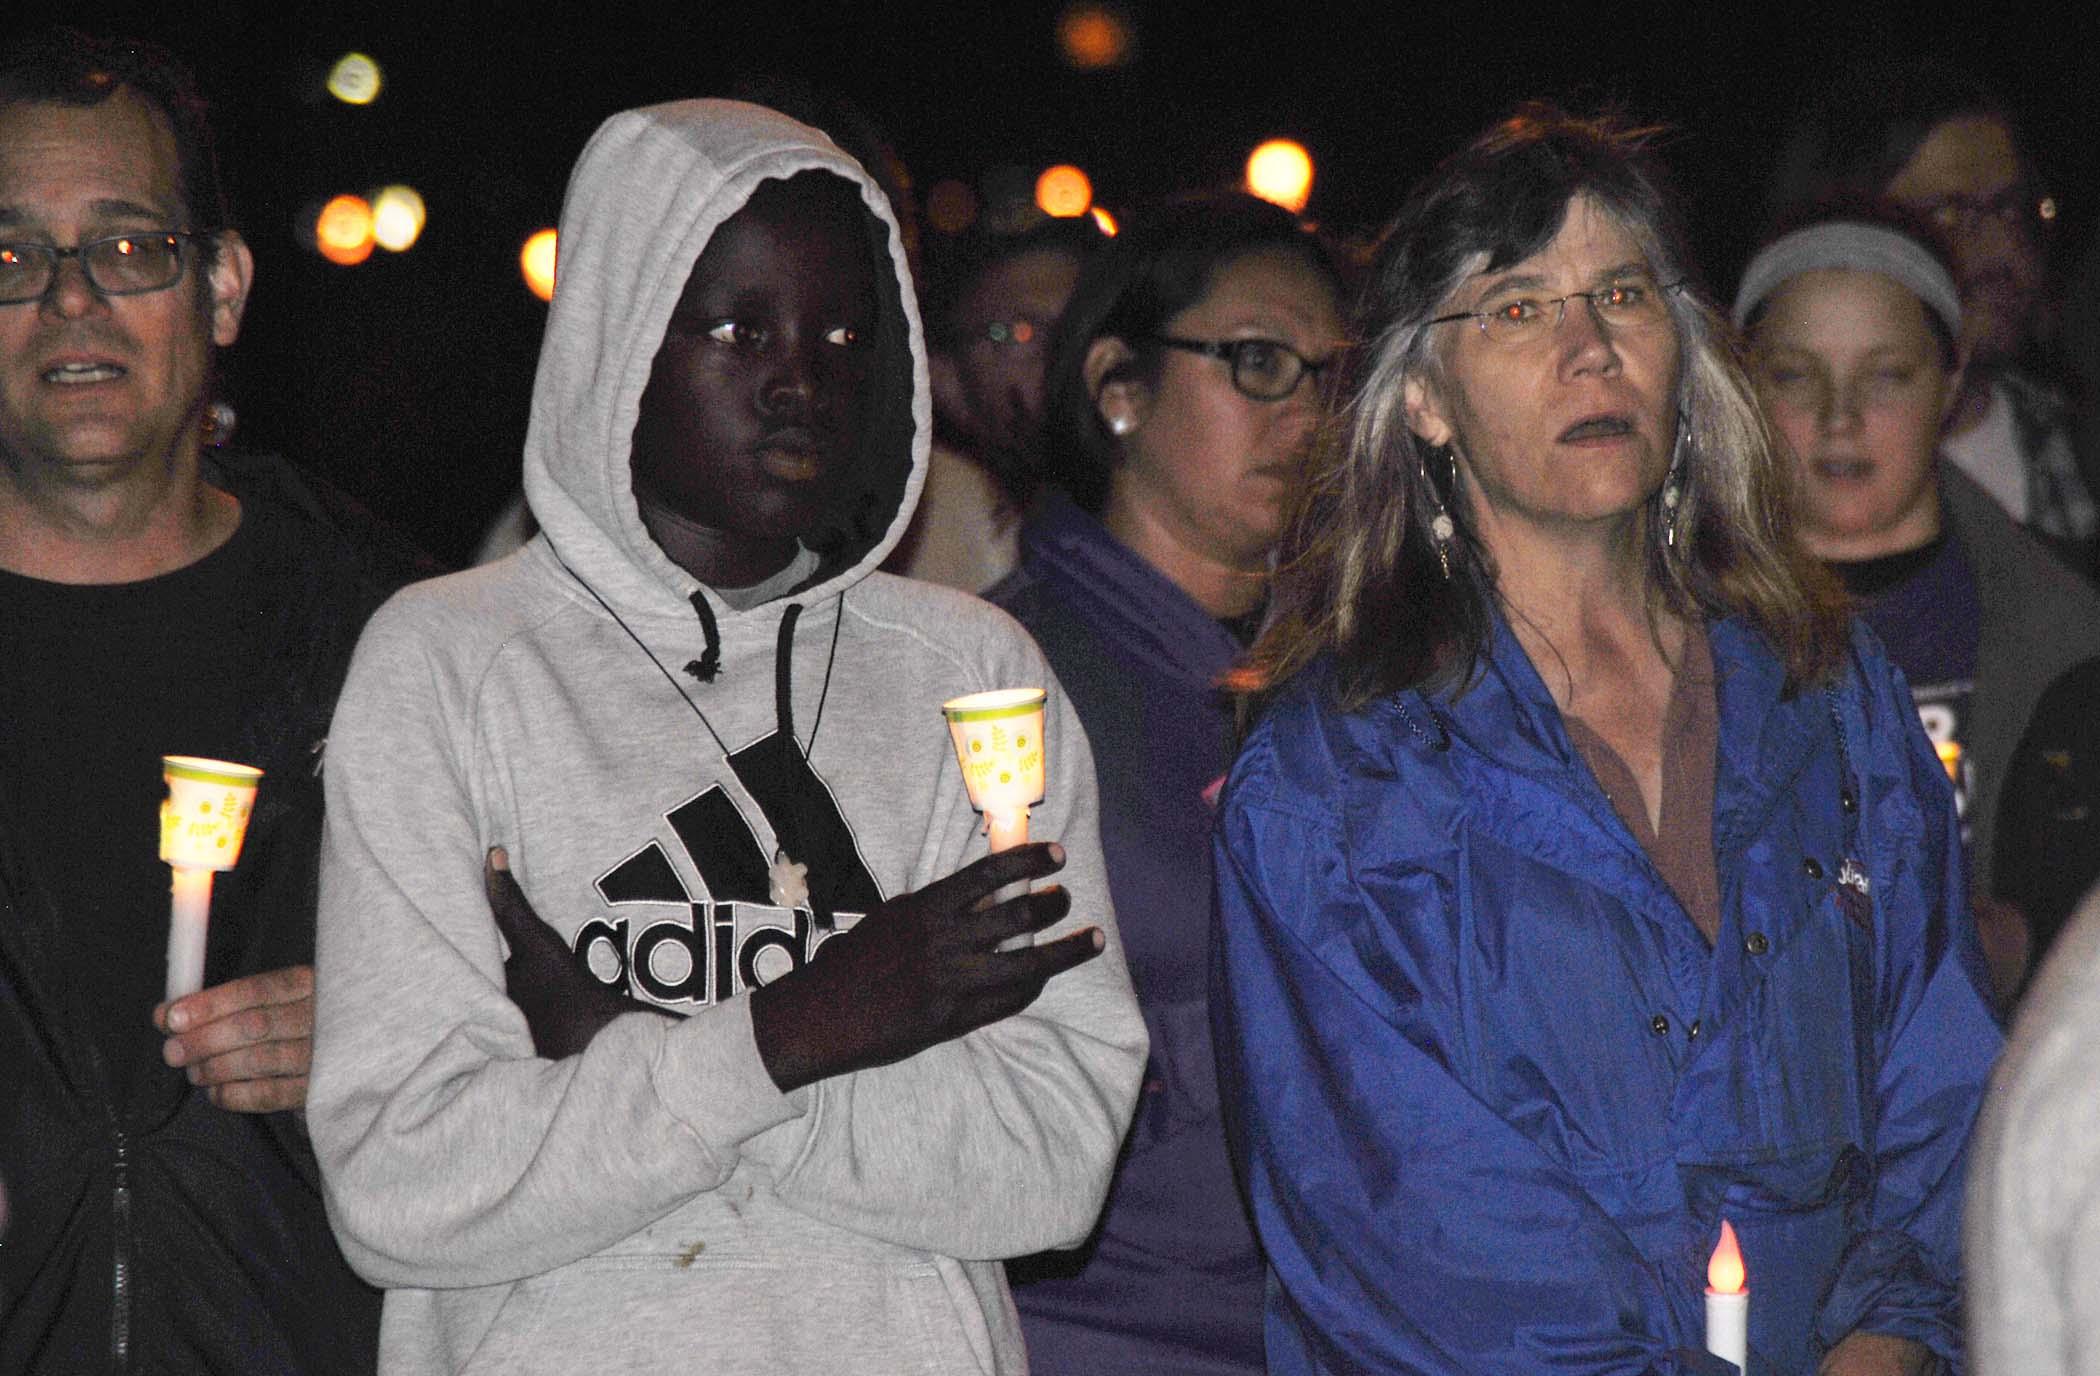 Candle lit vigil on Veterans Memorial Bridge to remember Heather Heyer - photo by C.S. Hagen